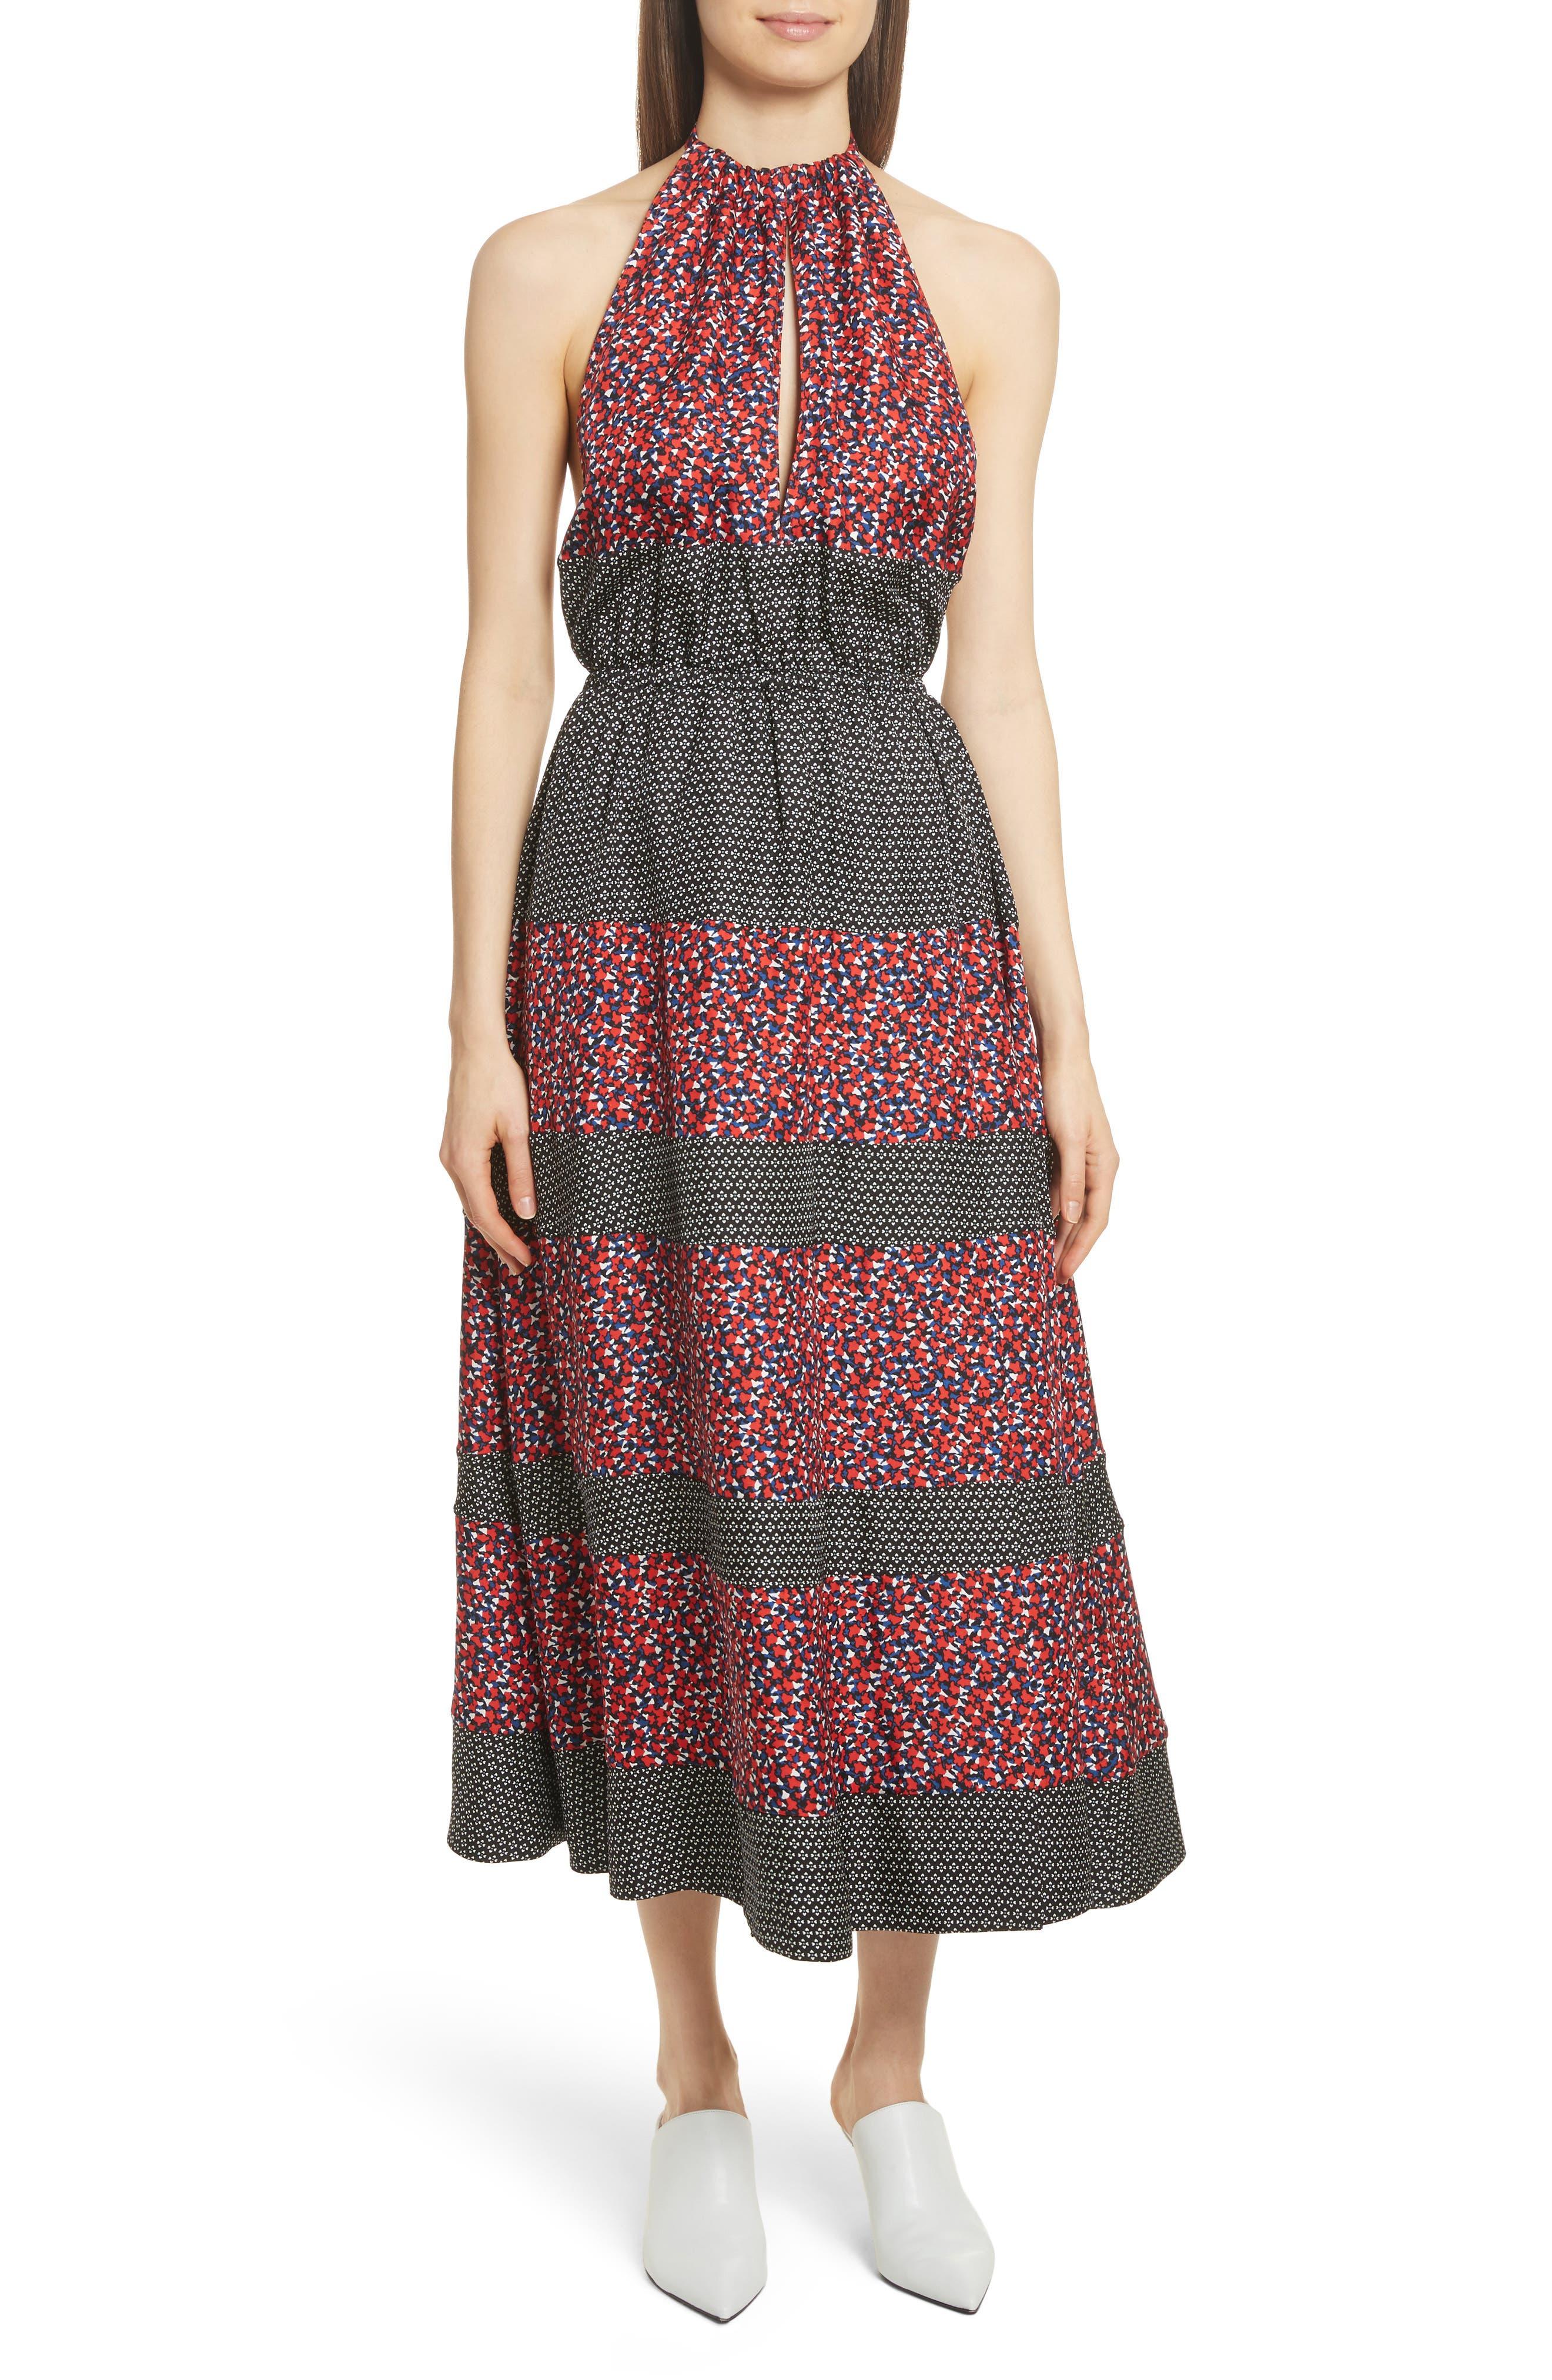 Main Image - Robert Rodriguez Mixed Print Halter Dress